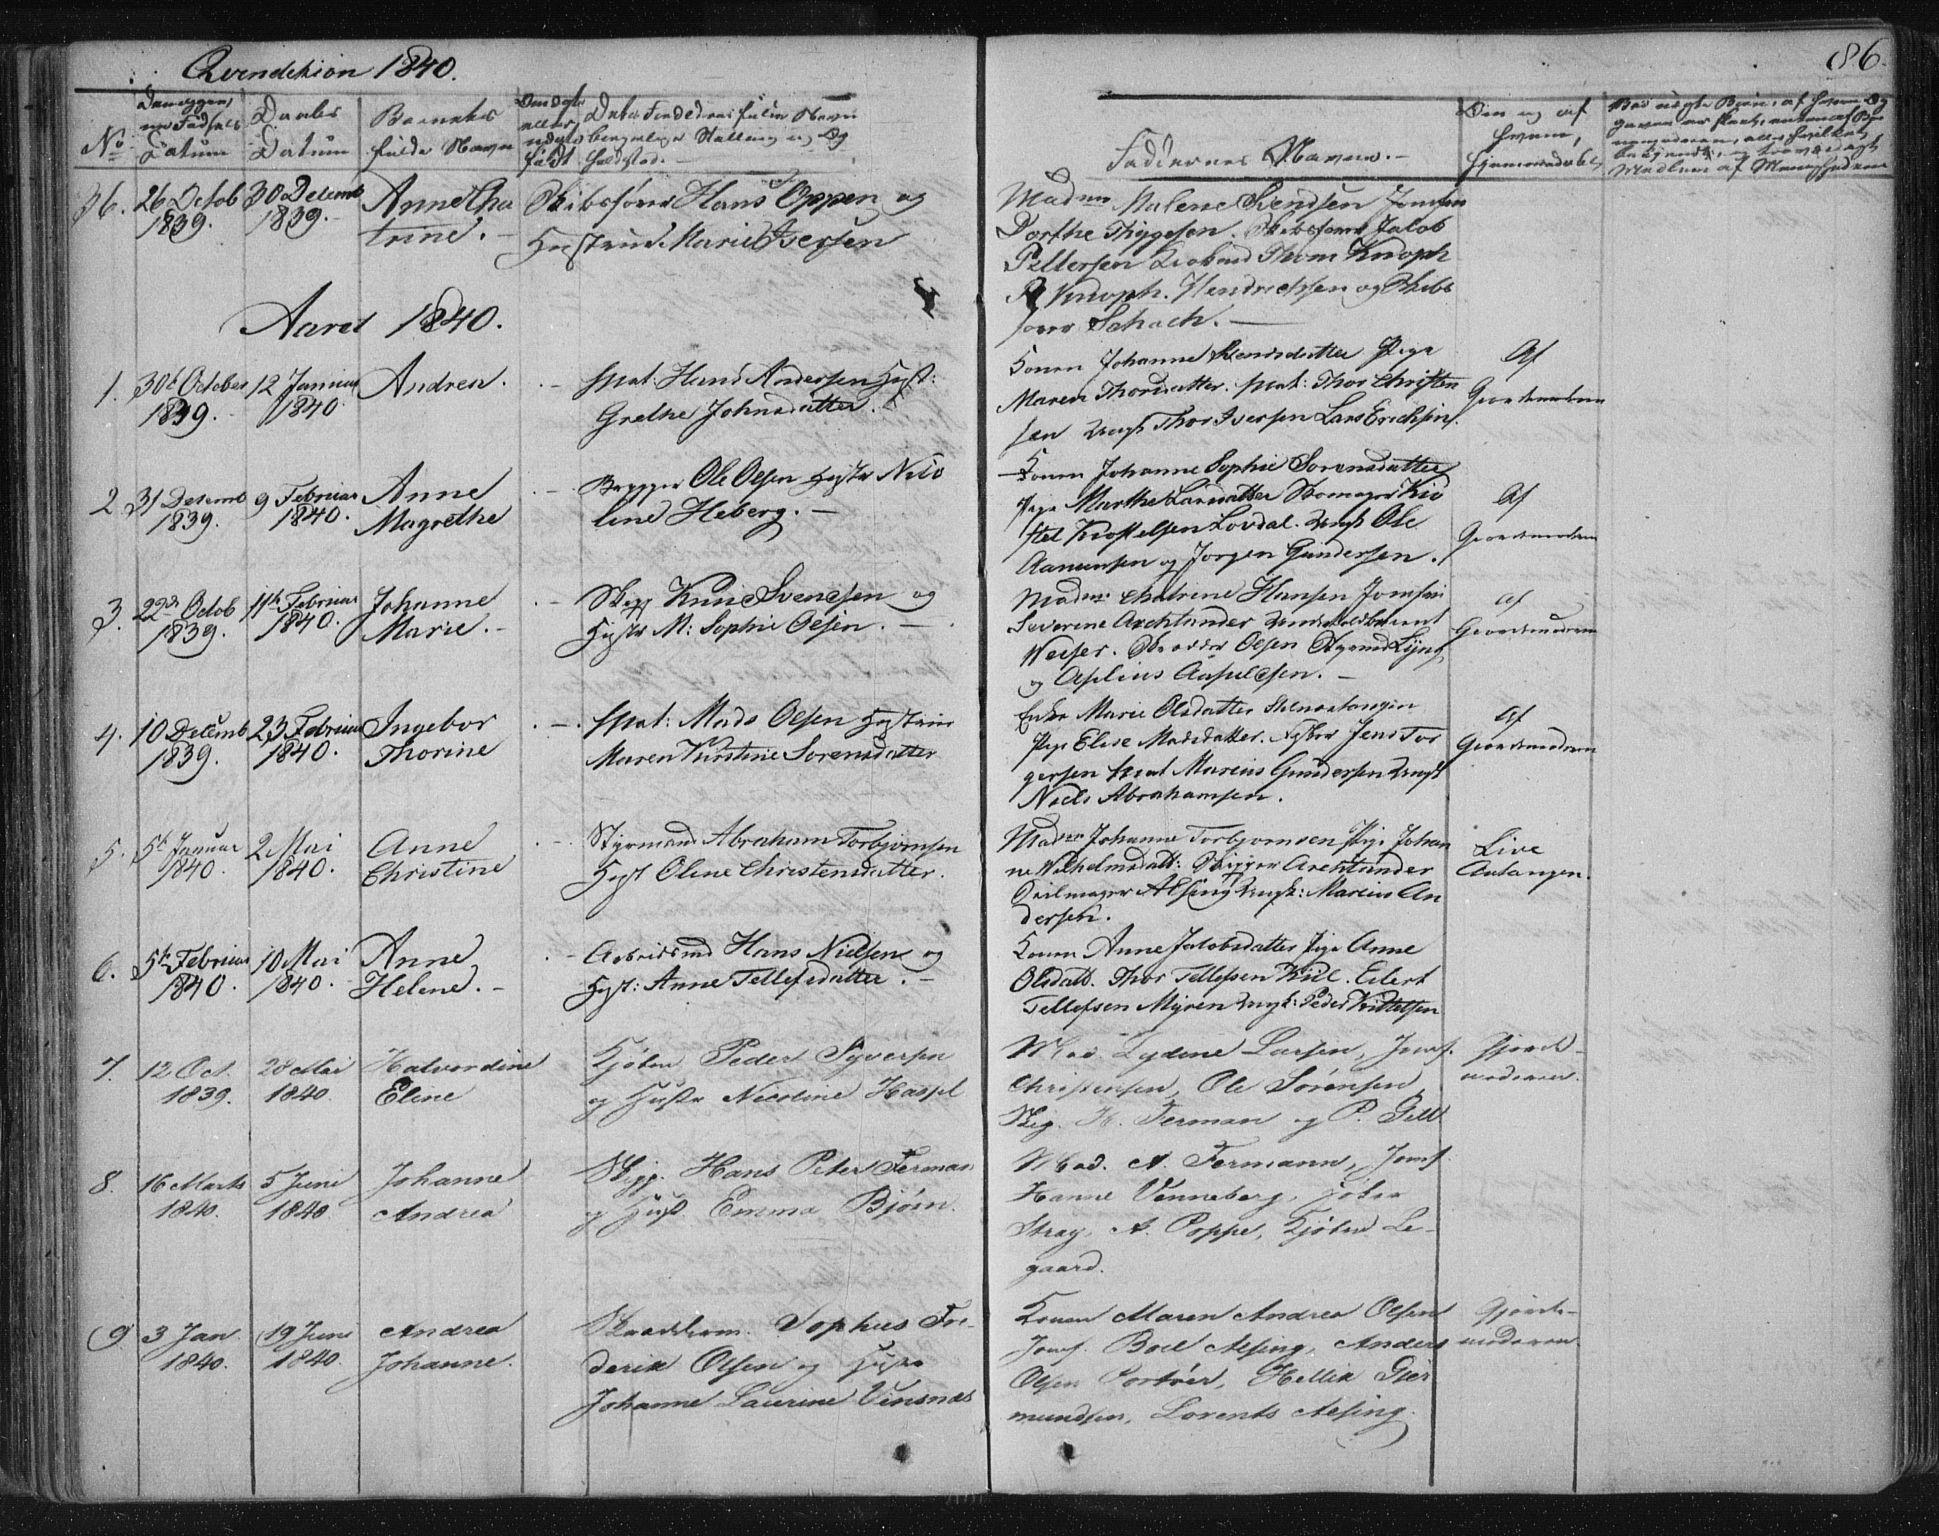 SAKO, Kragerø kirkebøker, F/Fa/L0005: Ministerialbok nr. 5, 1832-1847, s. 86